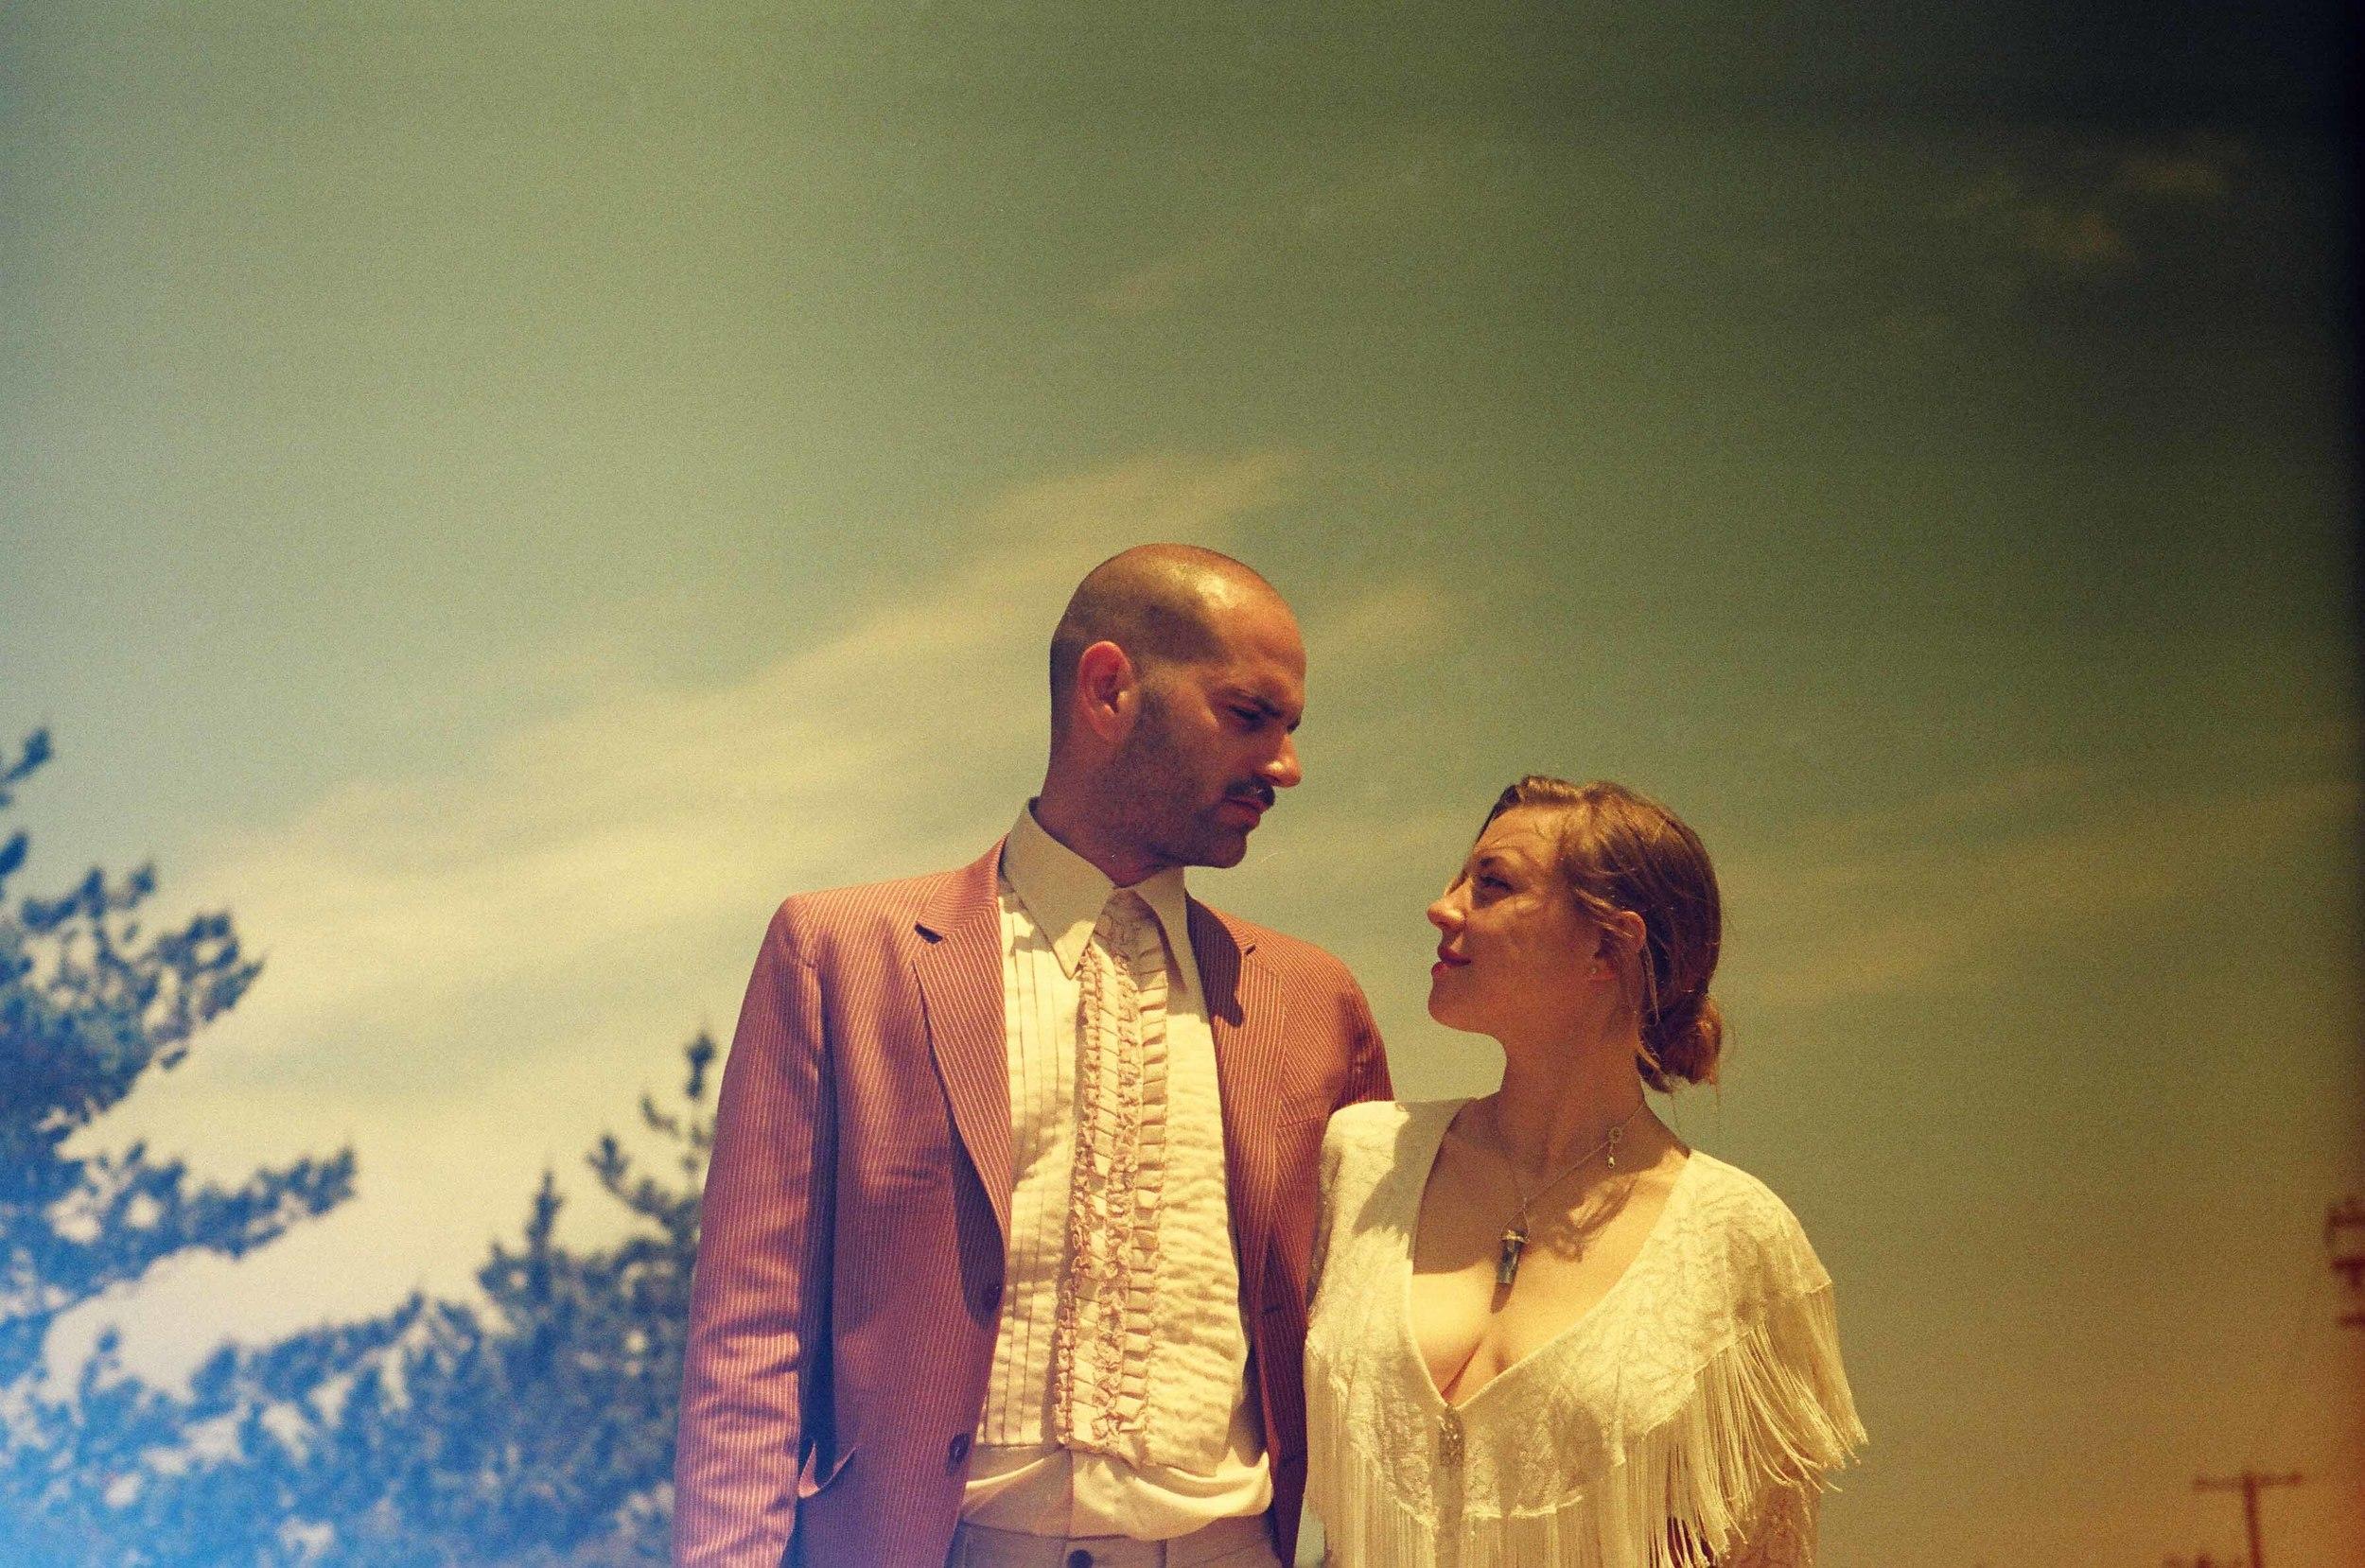 revolog kolor film wedding photography nyc brooklyn bohemian indie rock and roll wedding_ChelliseMichaelPhotography-20.jpg